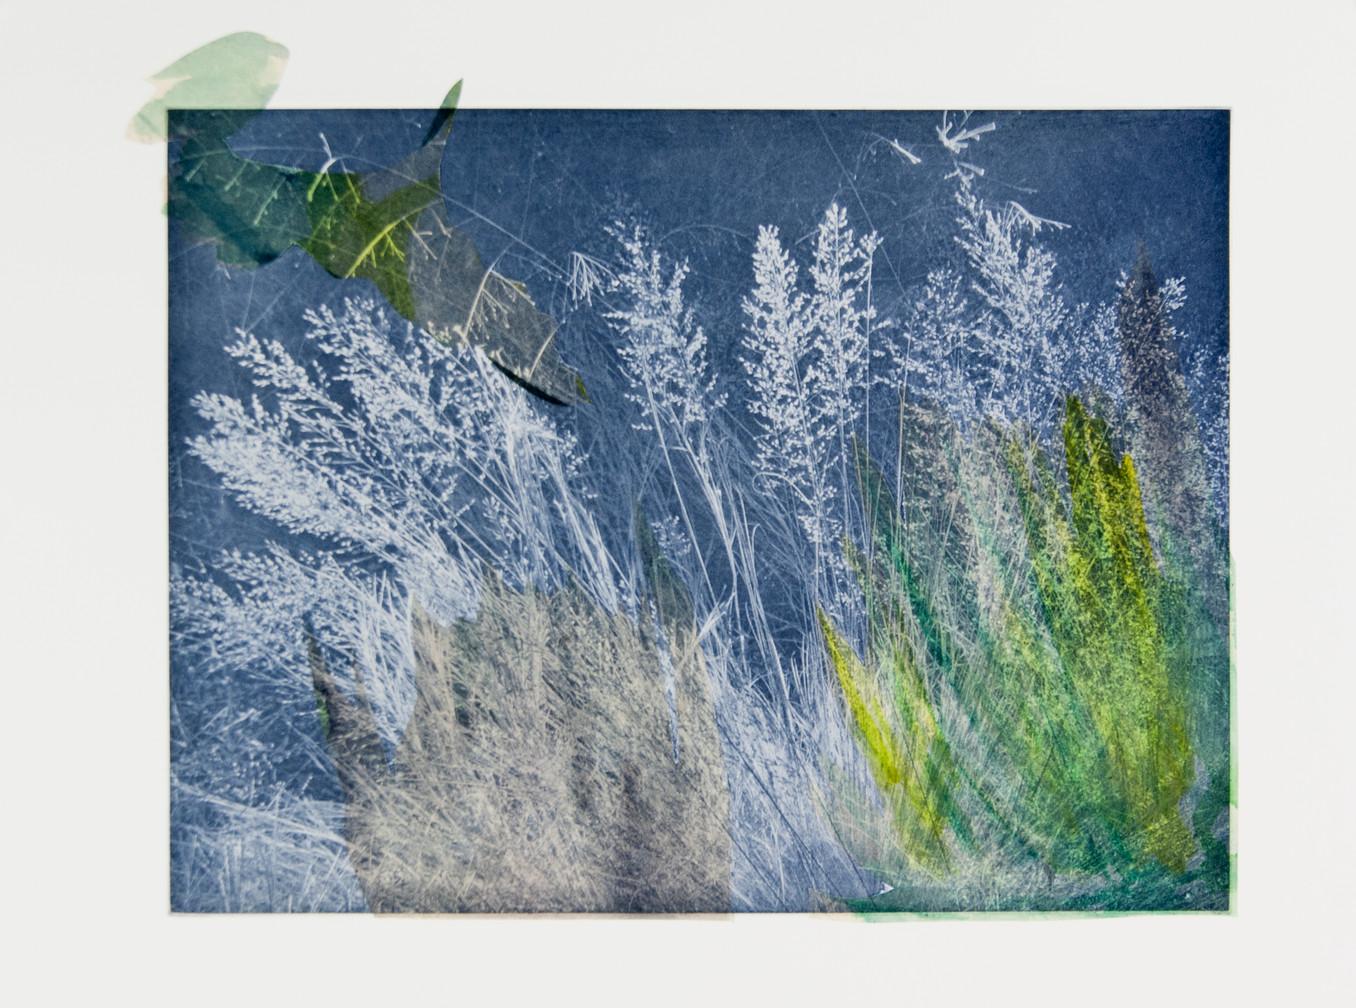 Taryn McMahon, Seeming Nature V